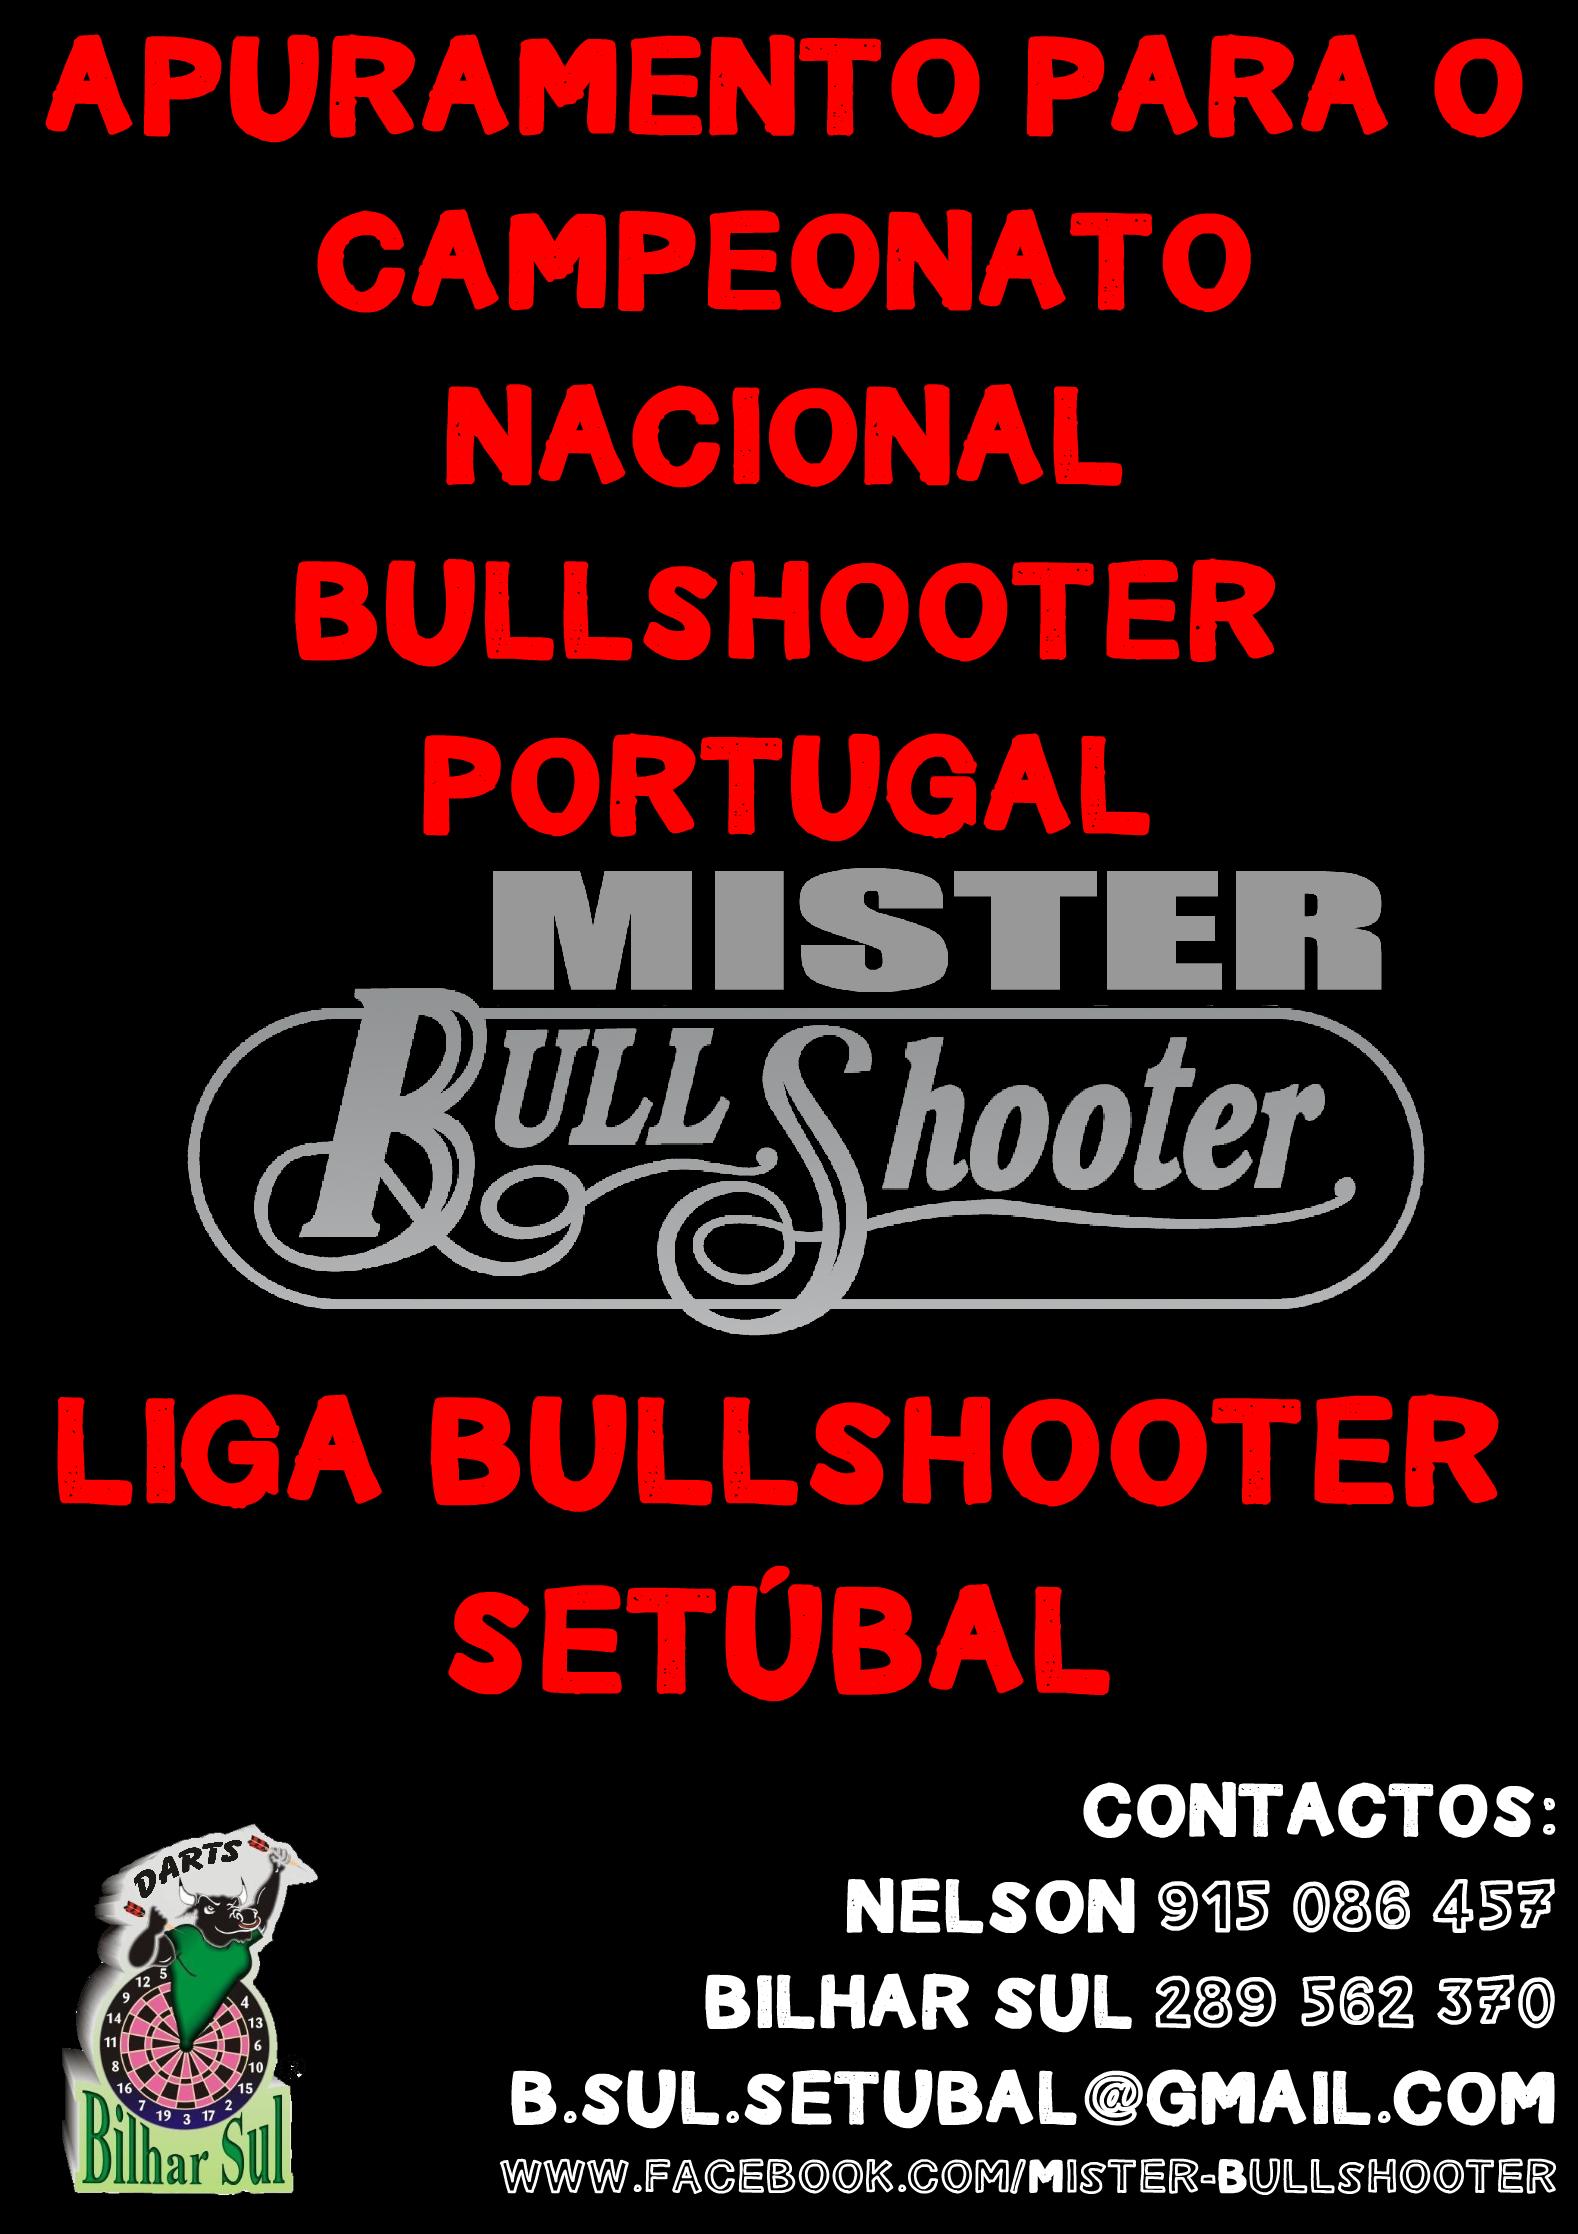 Apuramento para o Campeonato Nacional Bullshooter Portugal